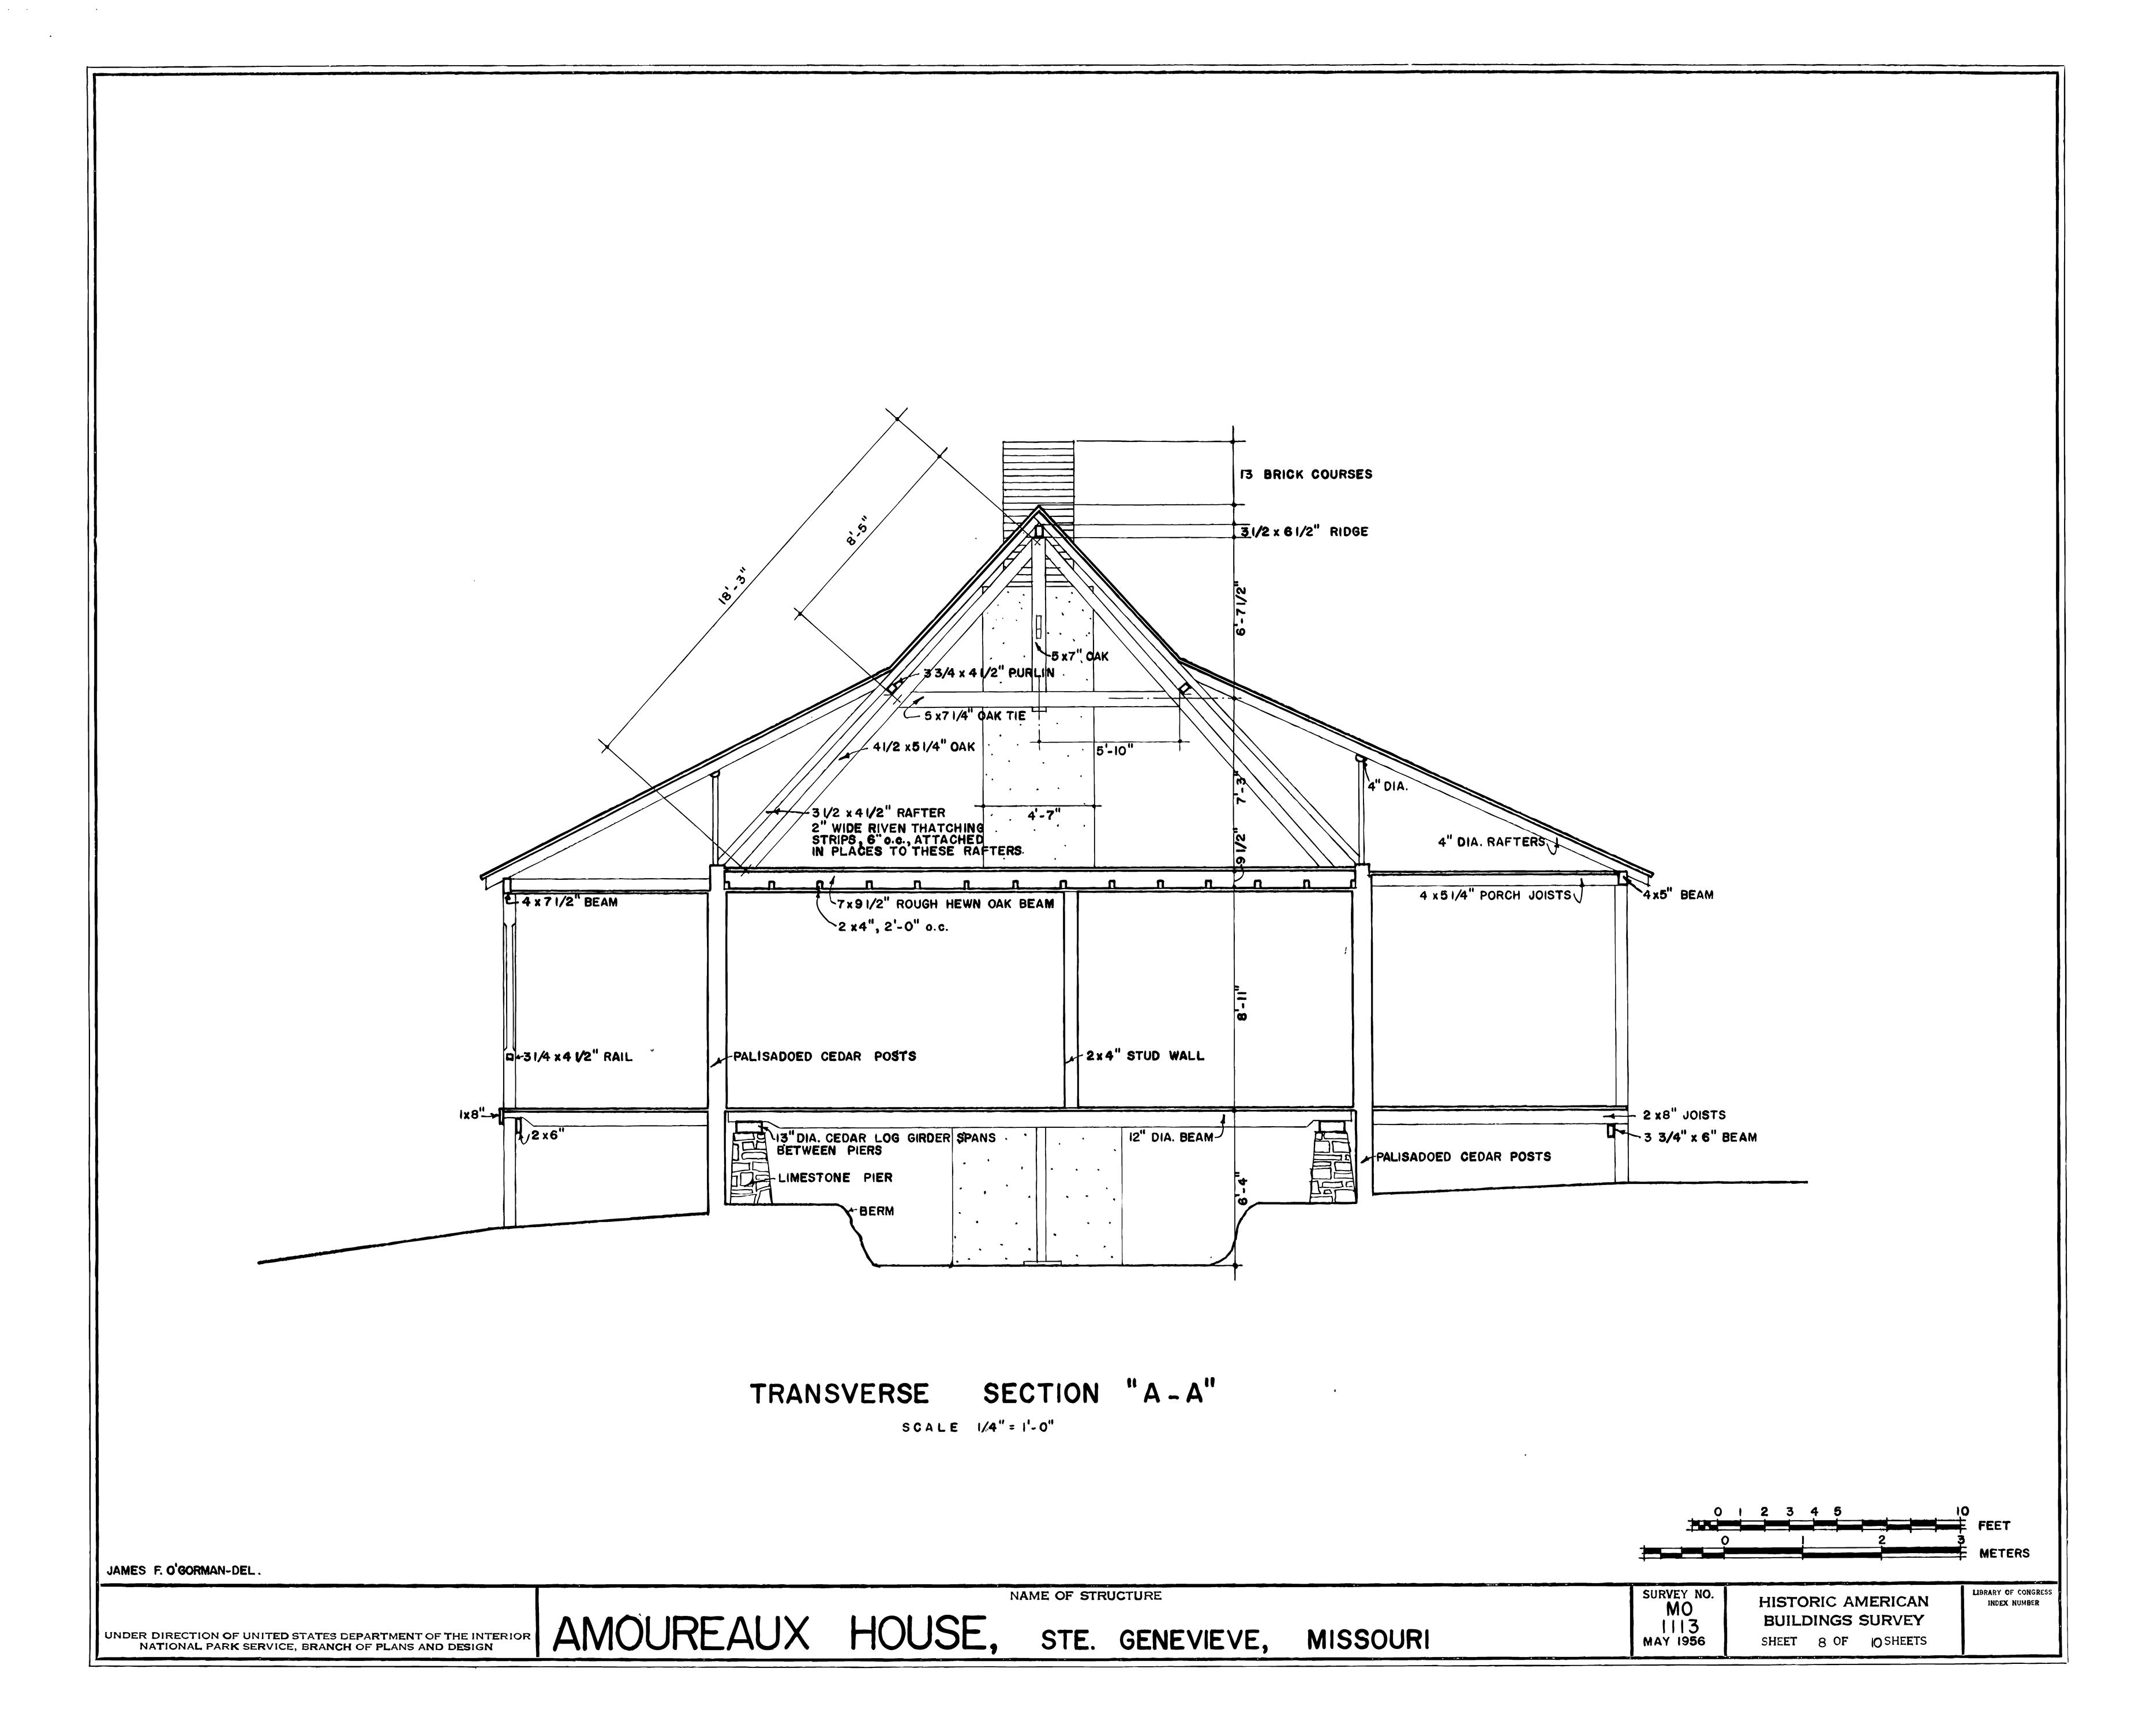 Structural Steel Drafting And Design David Maclaughlin Pdf